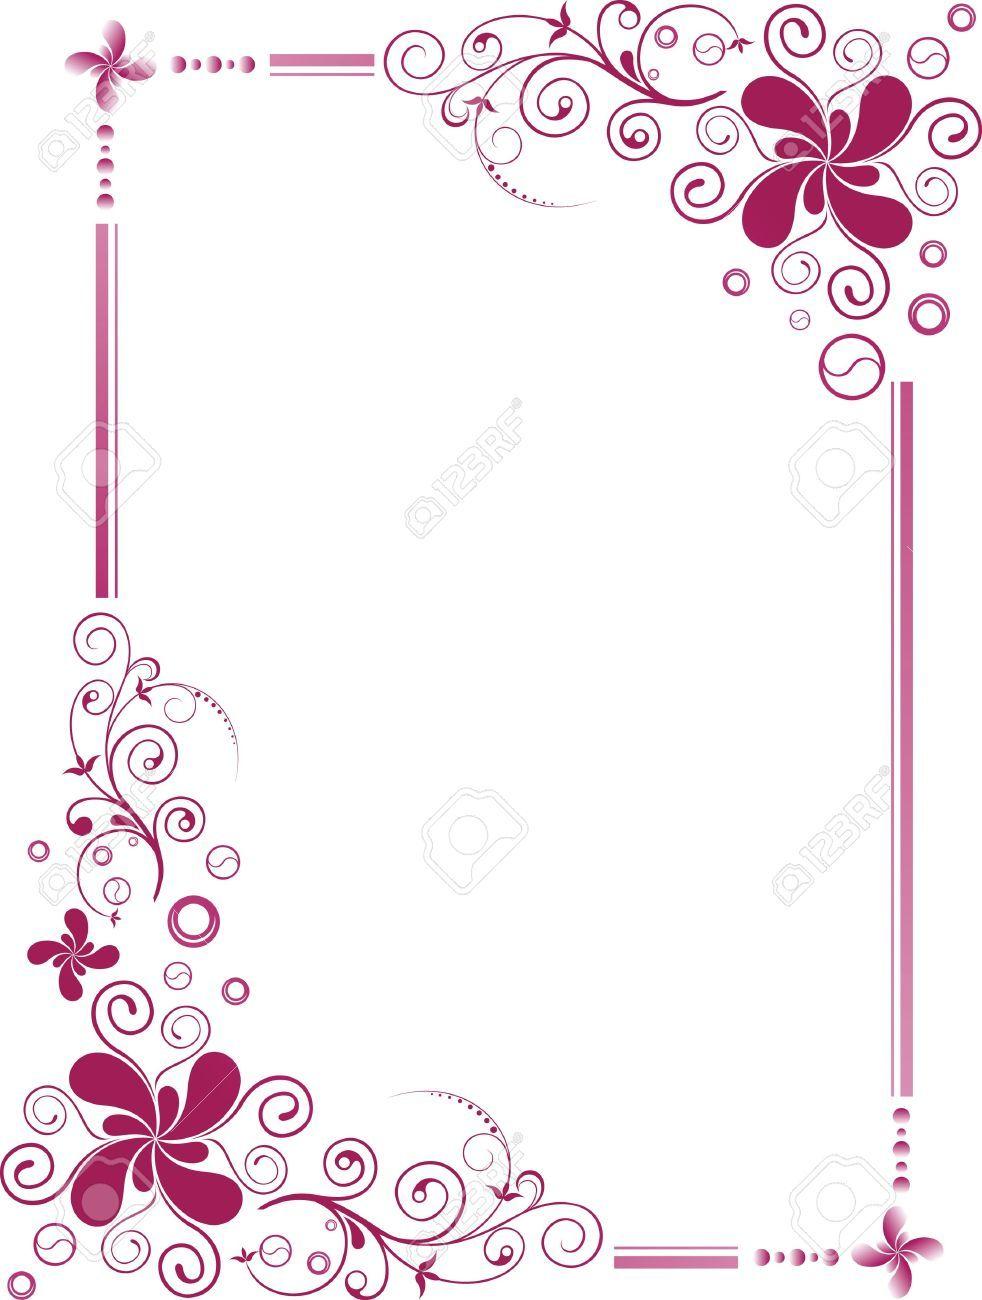 Cute Designs Printer Page Wallpapers 3492047 Floral Design Border Frame Stock Vector Wedding